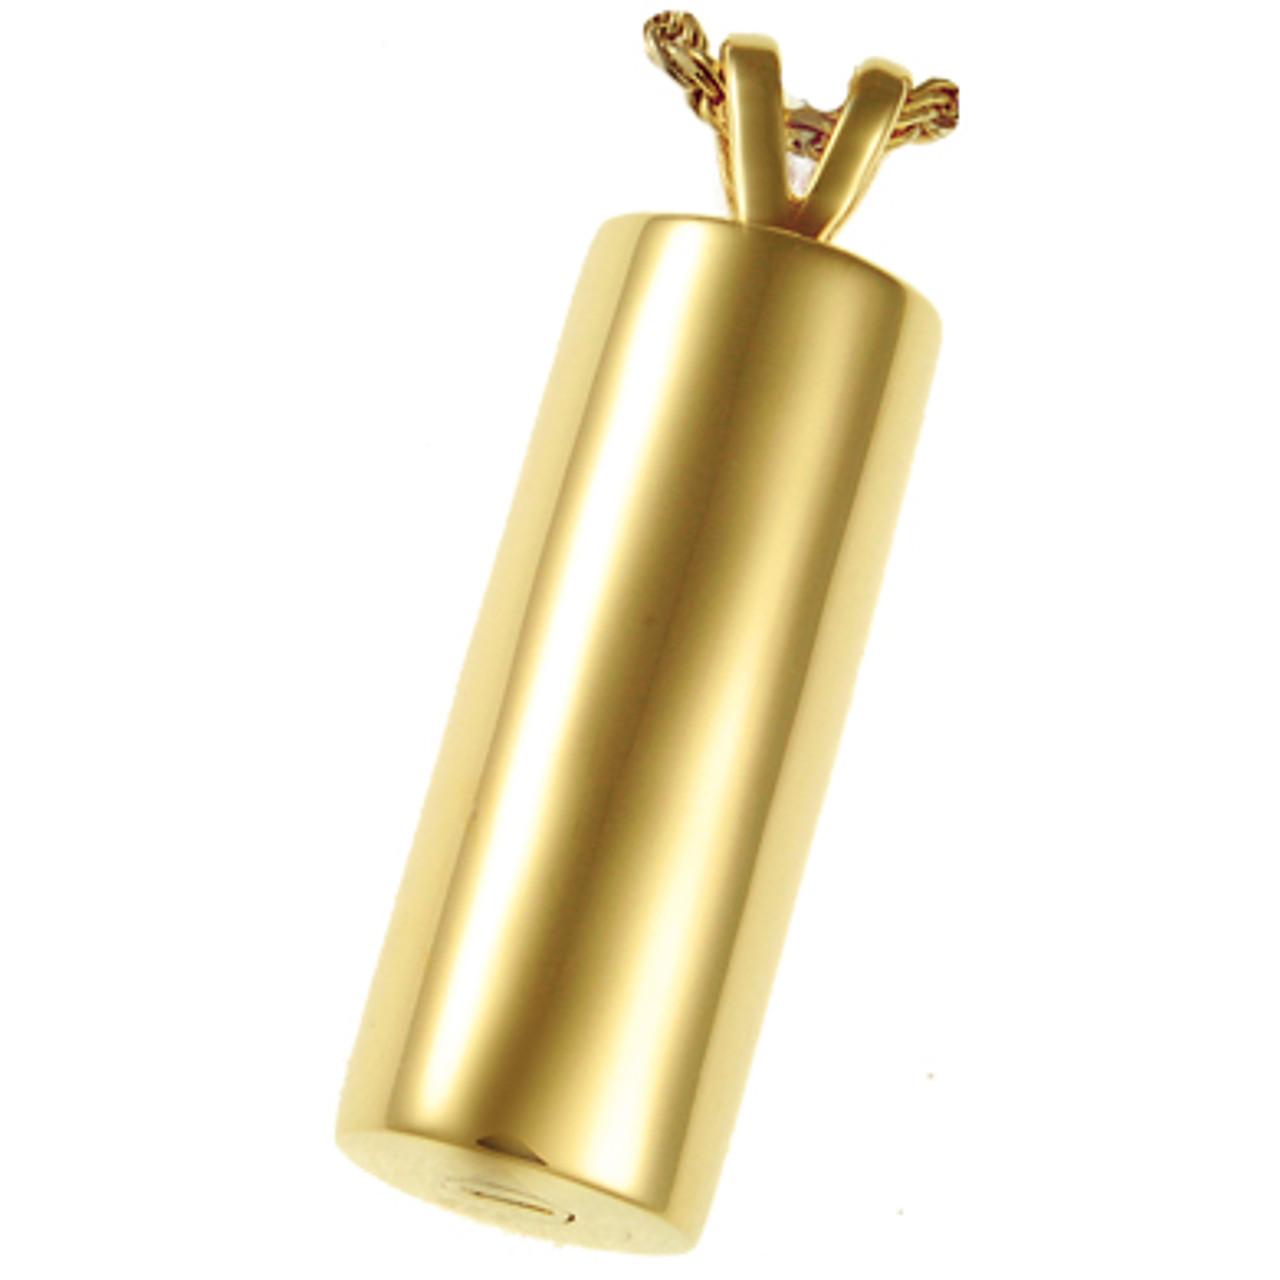 "Elegant Cylinder Dimensions are 3/4""W x 1 1/4""H."